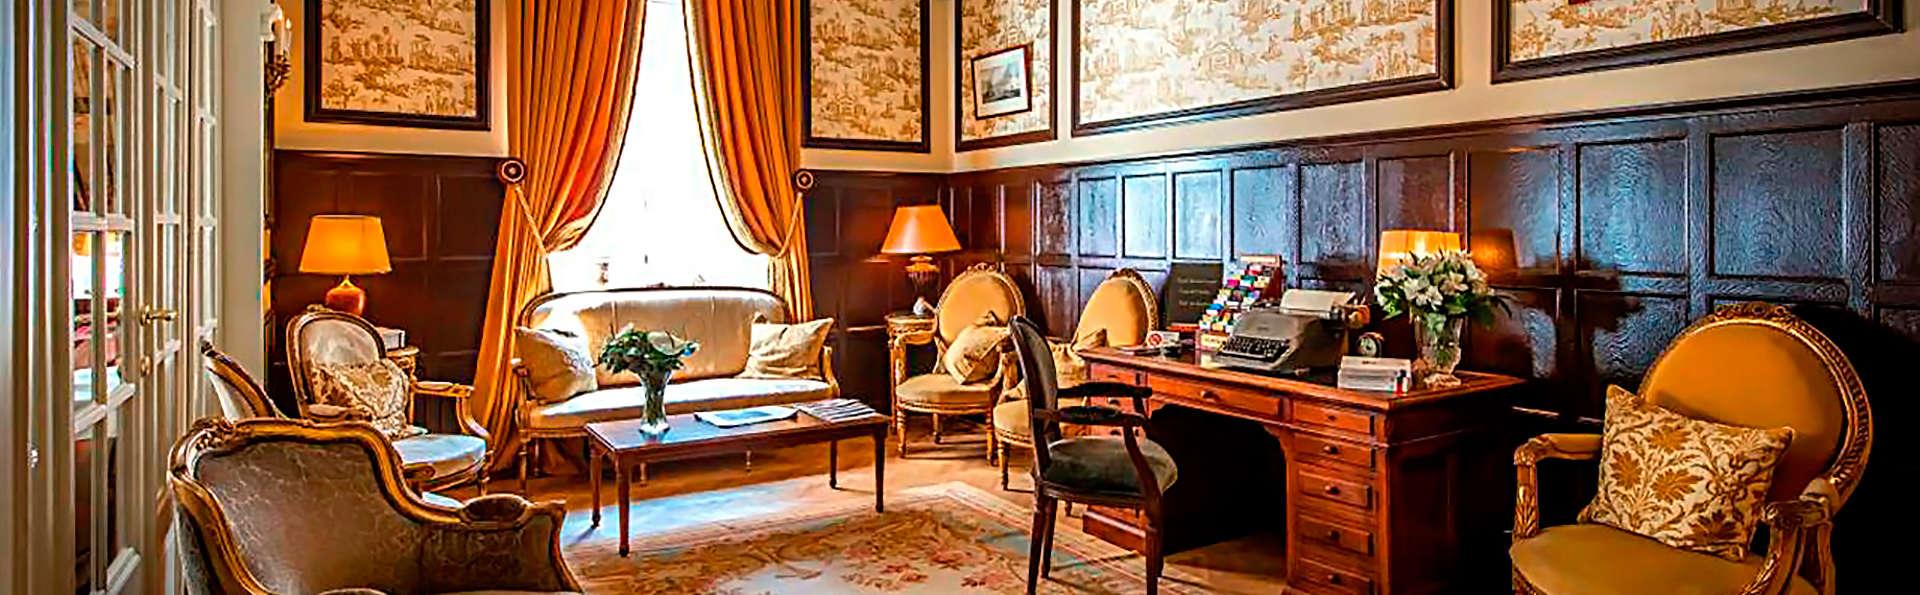 Relais & Châteaux Hotel Heritage - EDIT_lobby.jpg